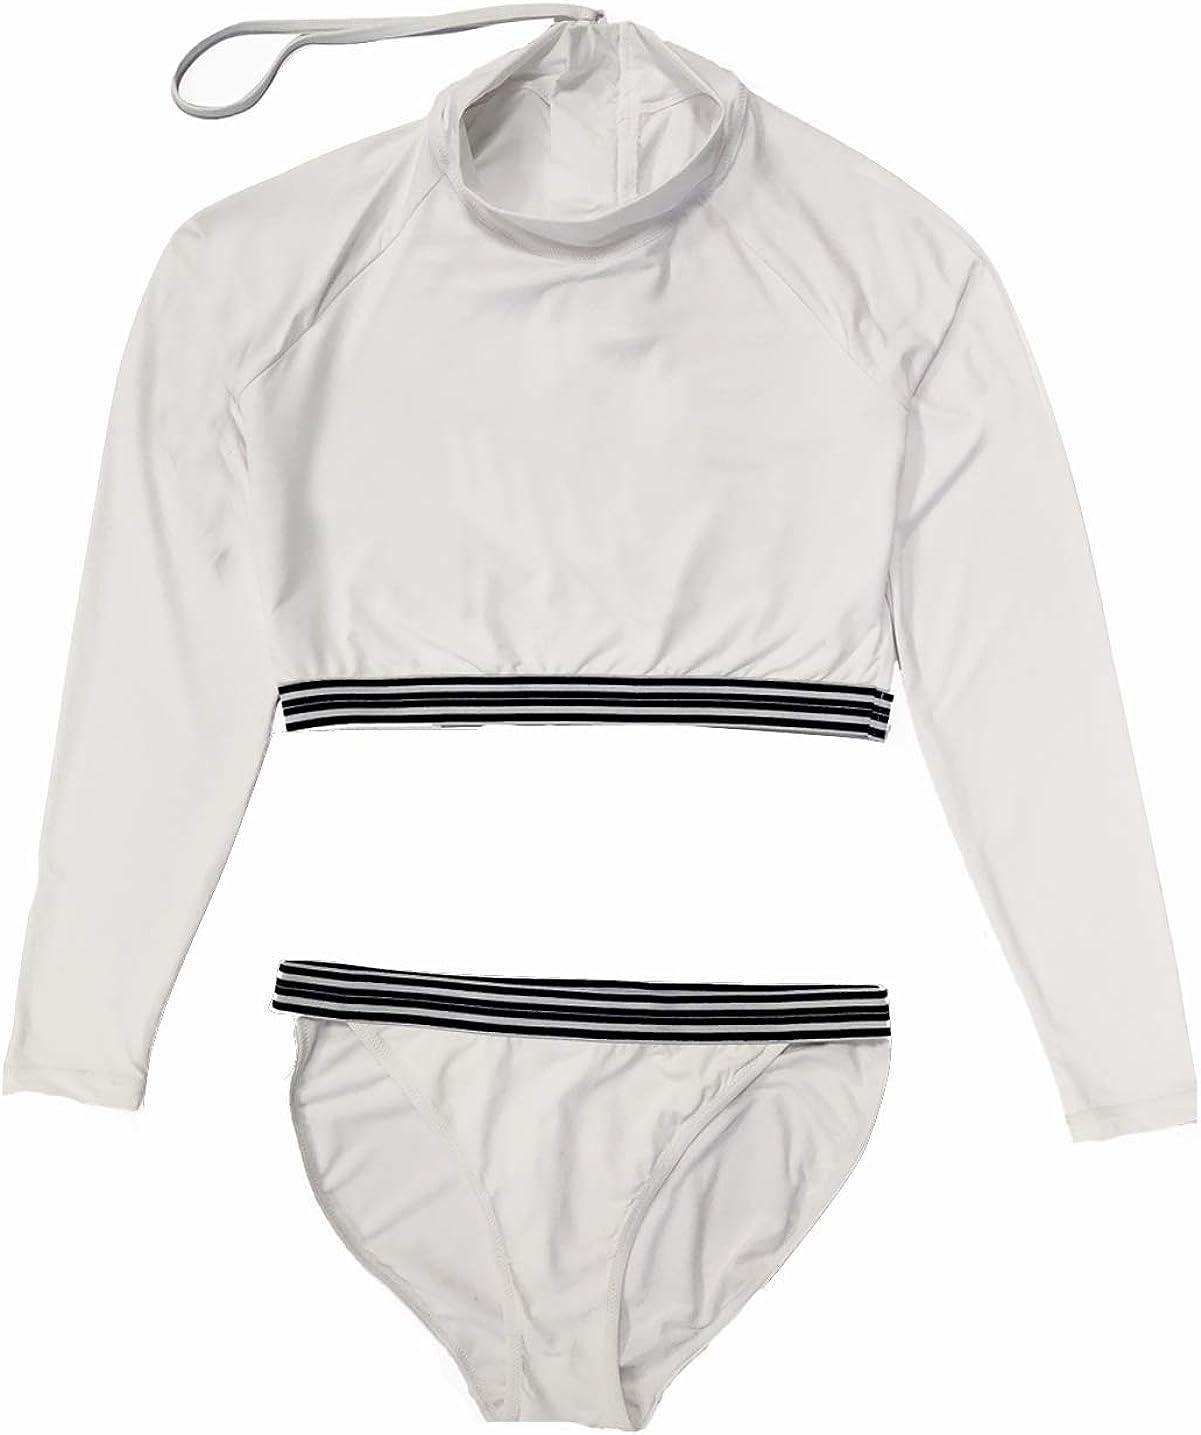 Women's Two Piece UPF 50+ Zip Surfing Rash Guard Sexy Bikini Long Sleeve Swimsuit Set